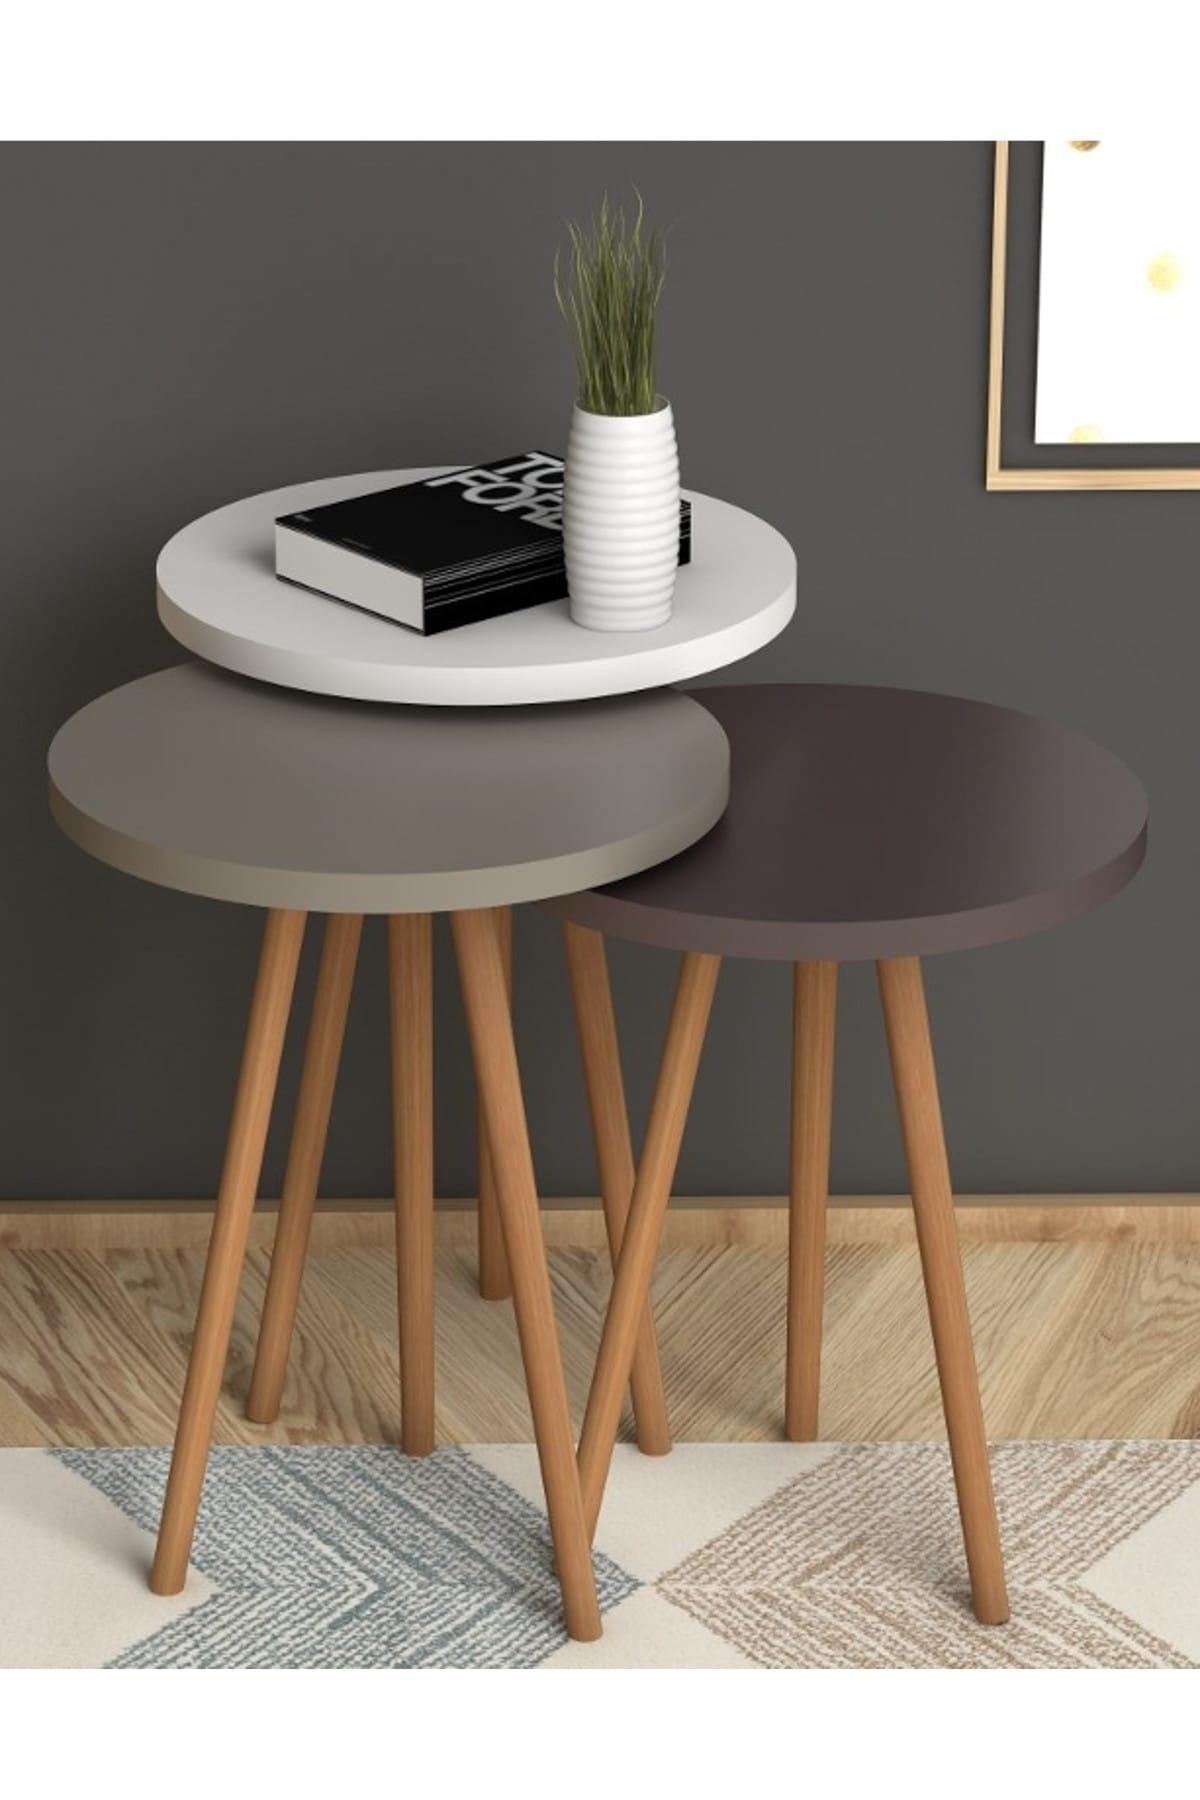 Roma Zigon sehpa Beyaz-Cappuccino-Kahve Masa Dekor Sehpa Oturma Odası Şık Moda üçlü modern ahşap kahverengi sehpa kahve sehpası çay sehpası meyve masası kanepe yanı oturma odası için mobilya sehpa